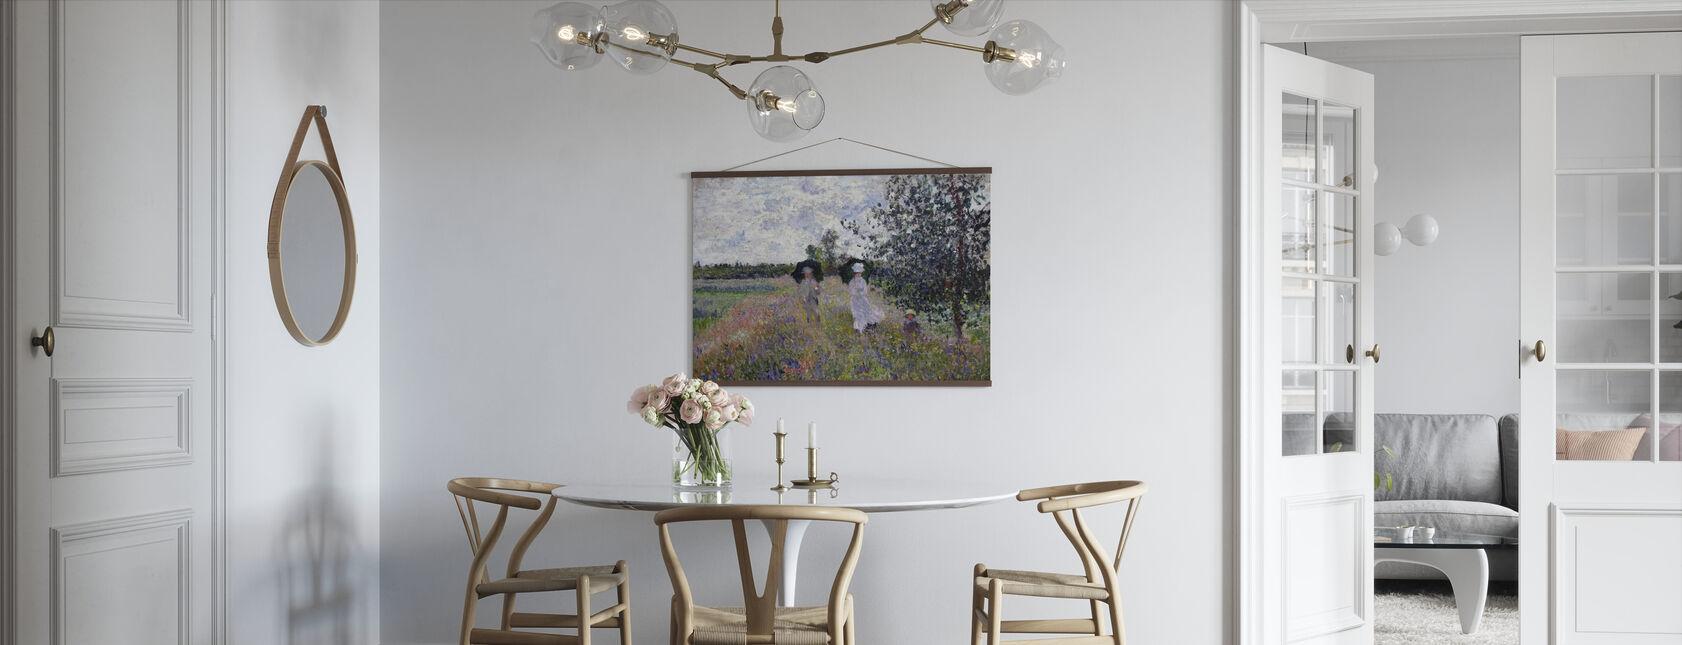 Promenade - Claude Monet - Poster - Kök